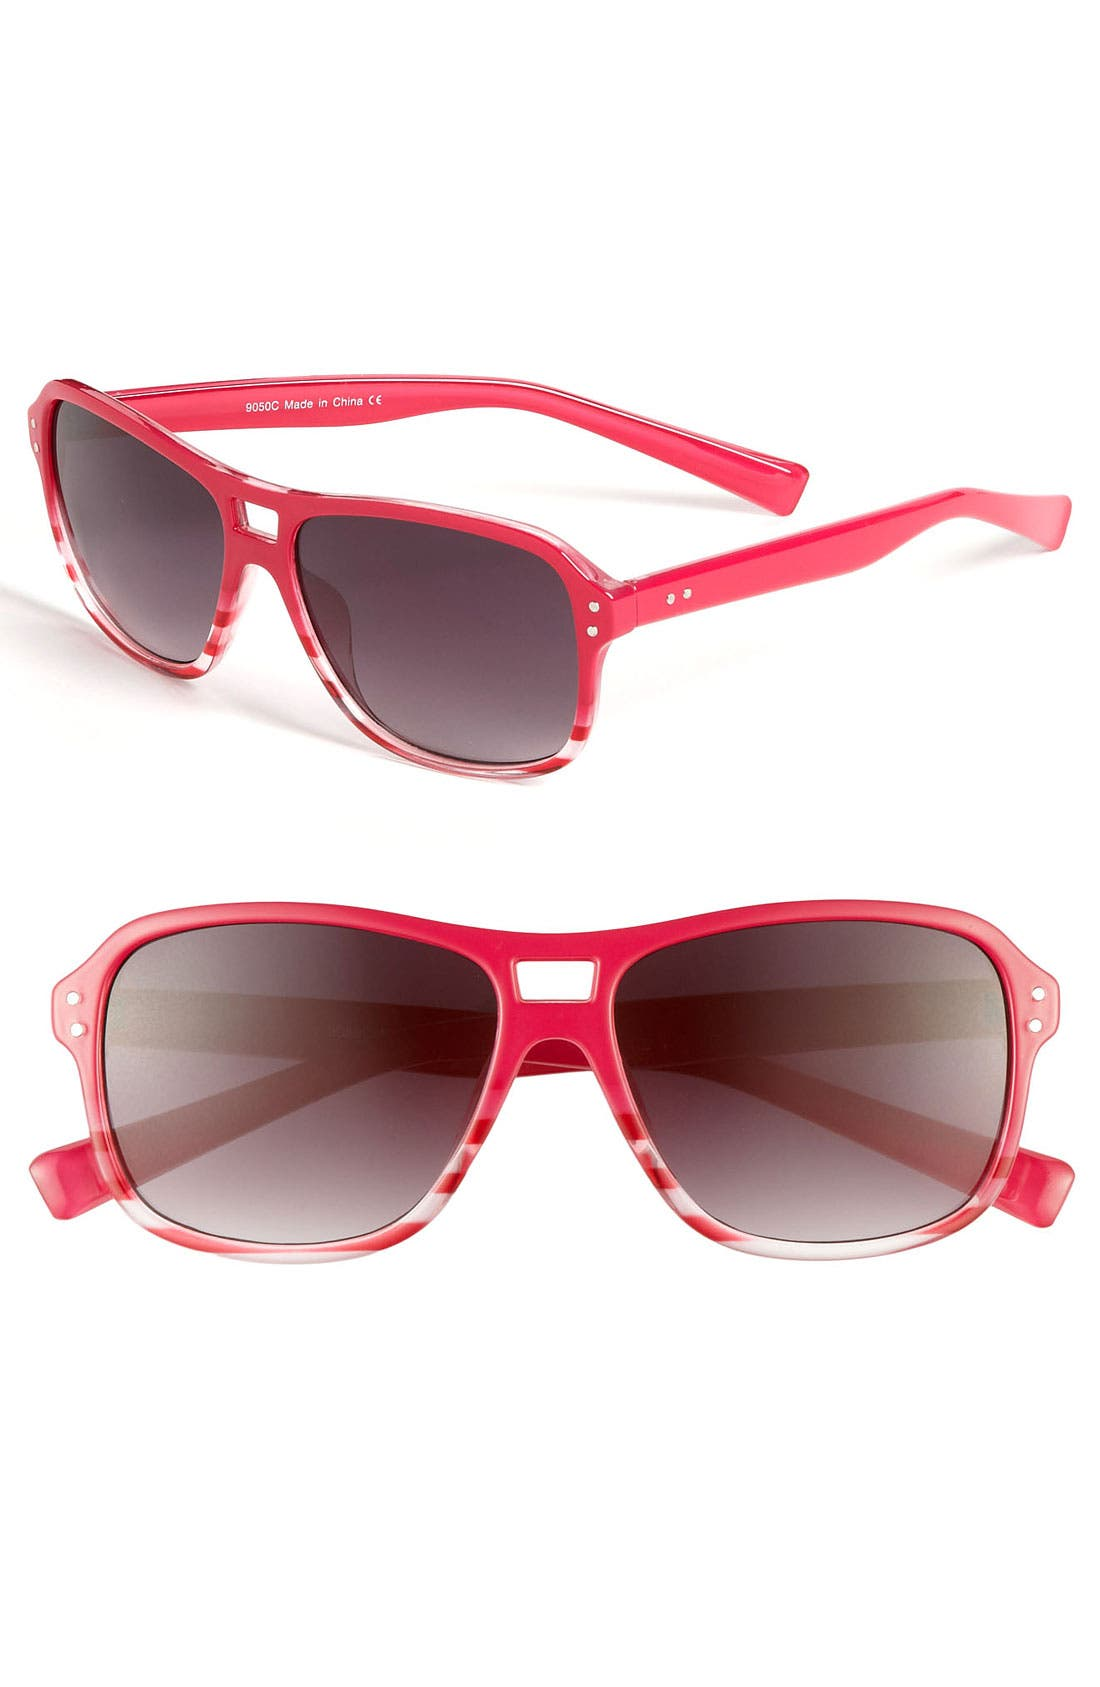 Main Image - KW 'Everest' Sunglasses